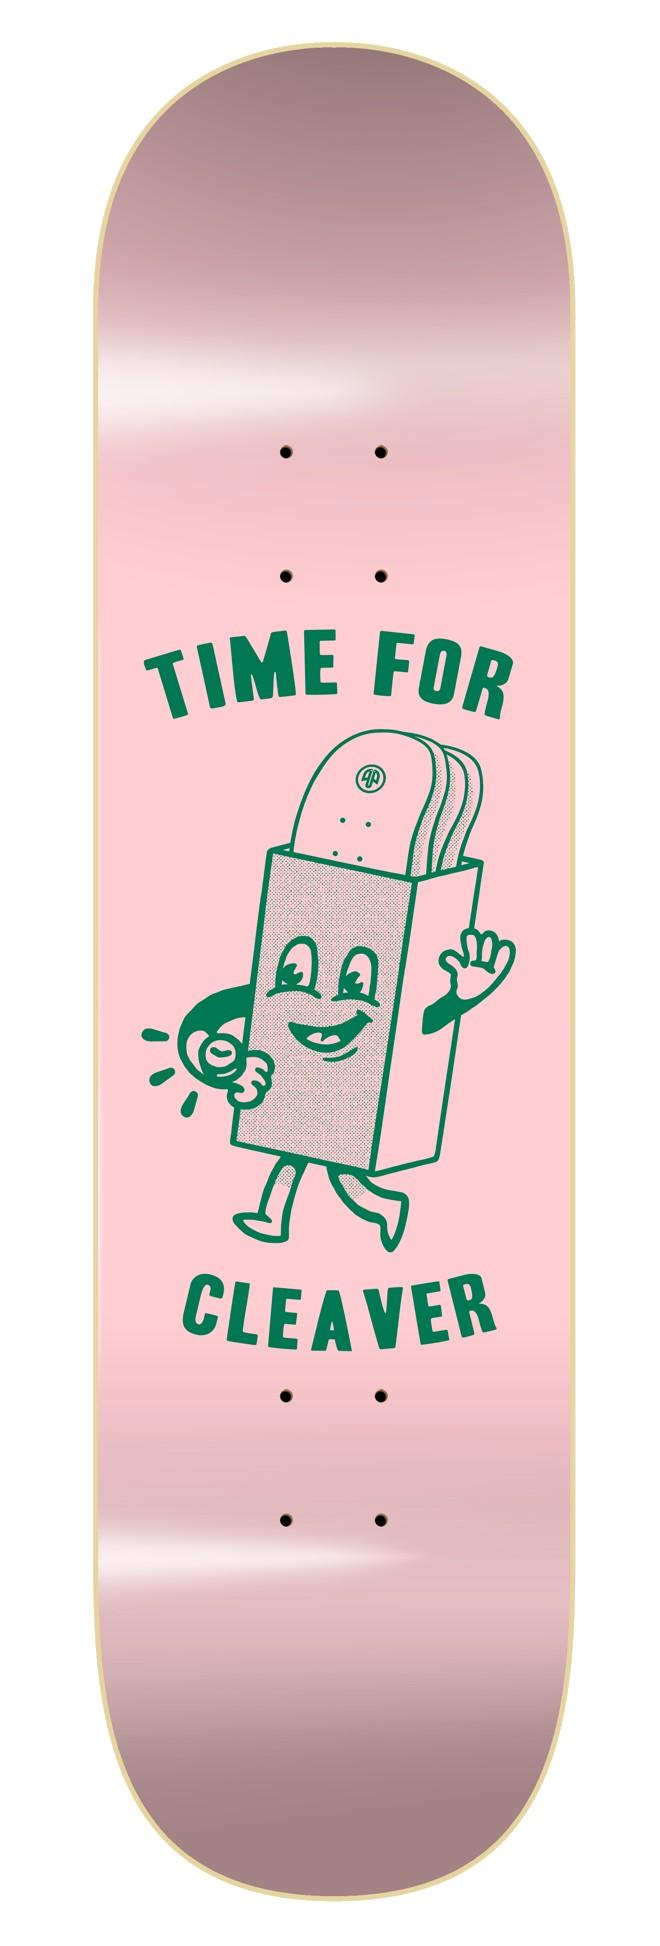 "CLEAVER ""TIME FOR PINK"" SKATEBOARD DECK"